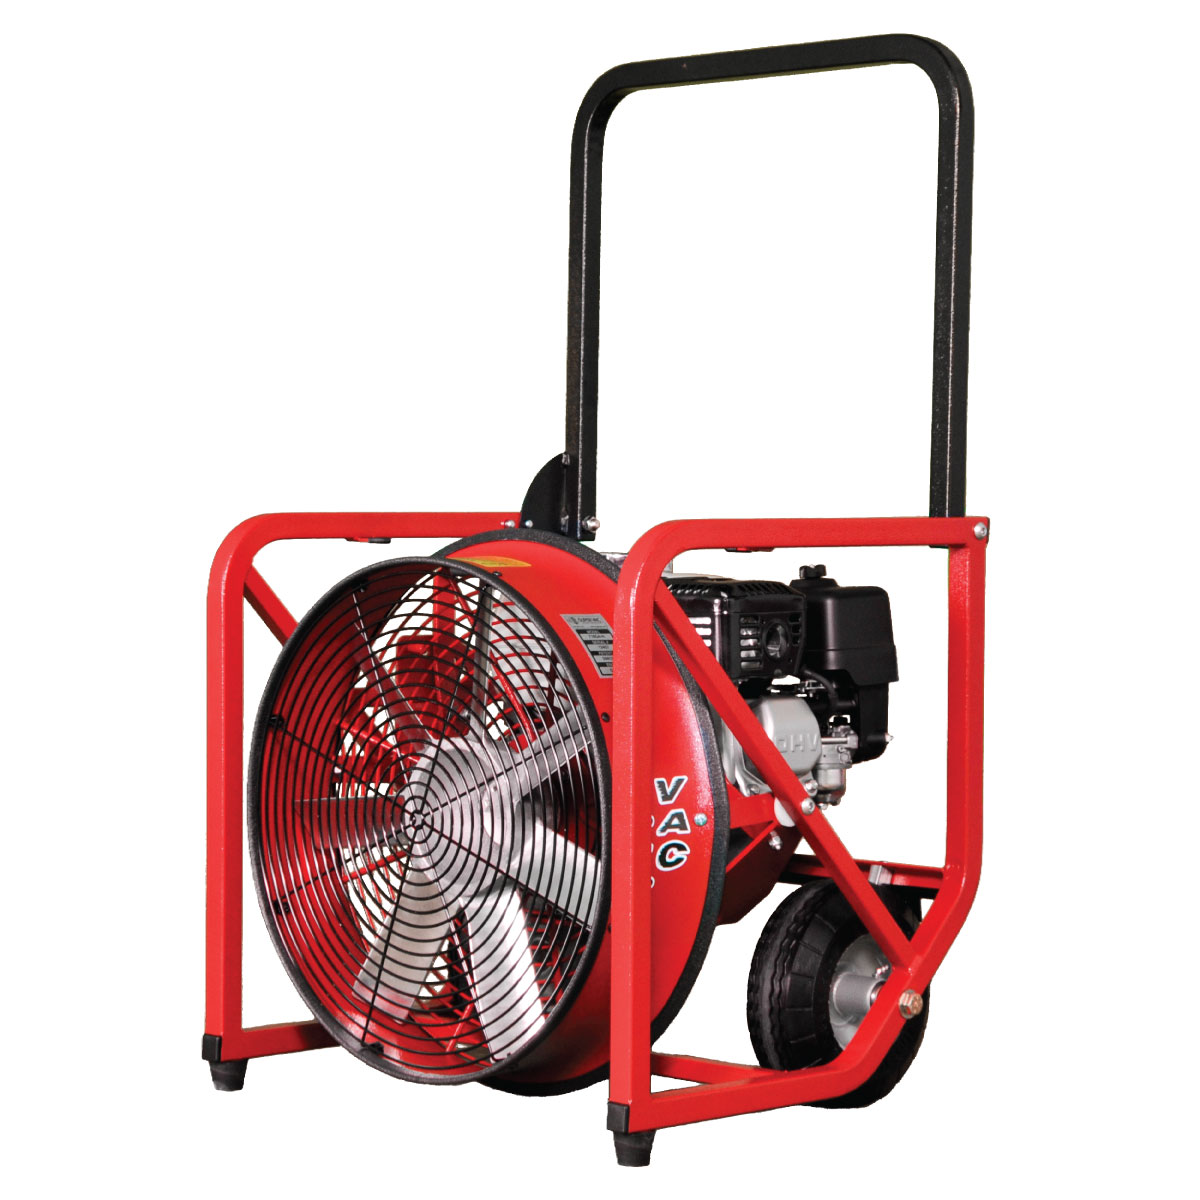 Gas Powered Ventilator : Gas powered